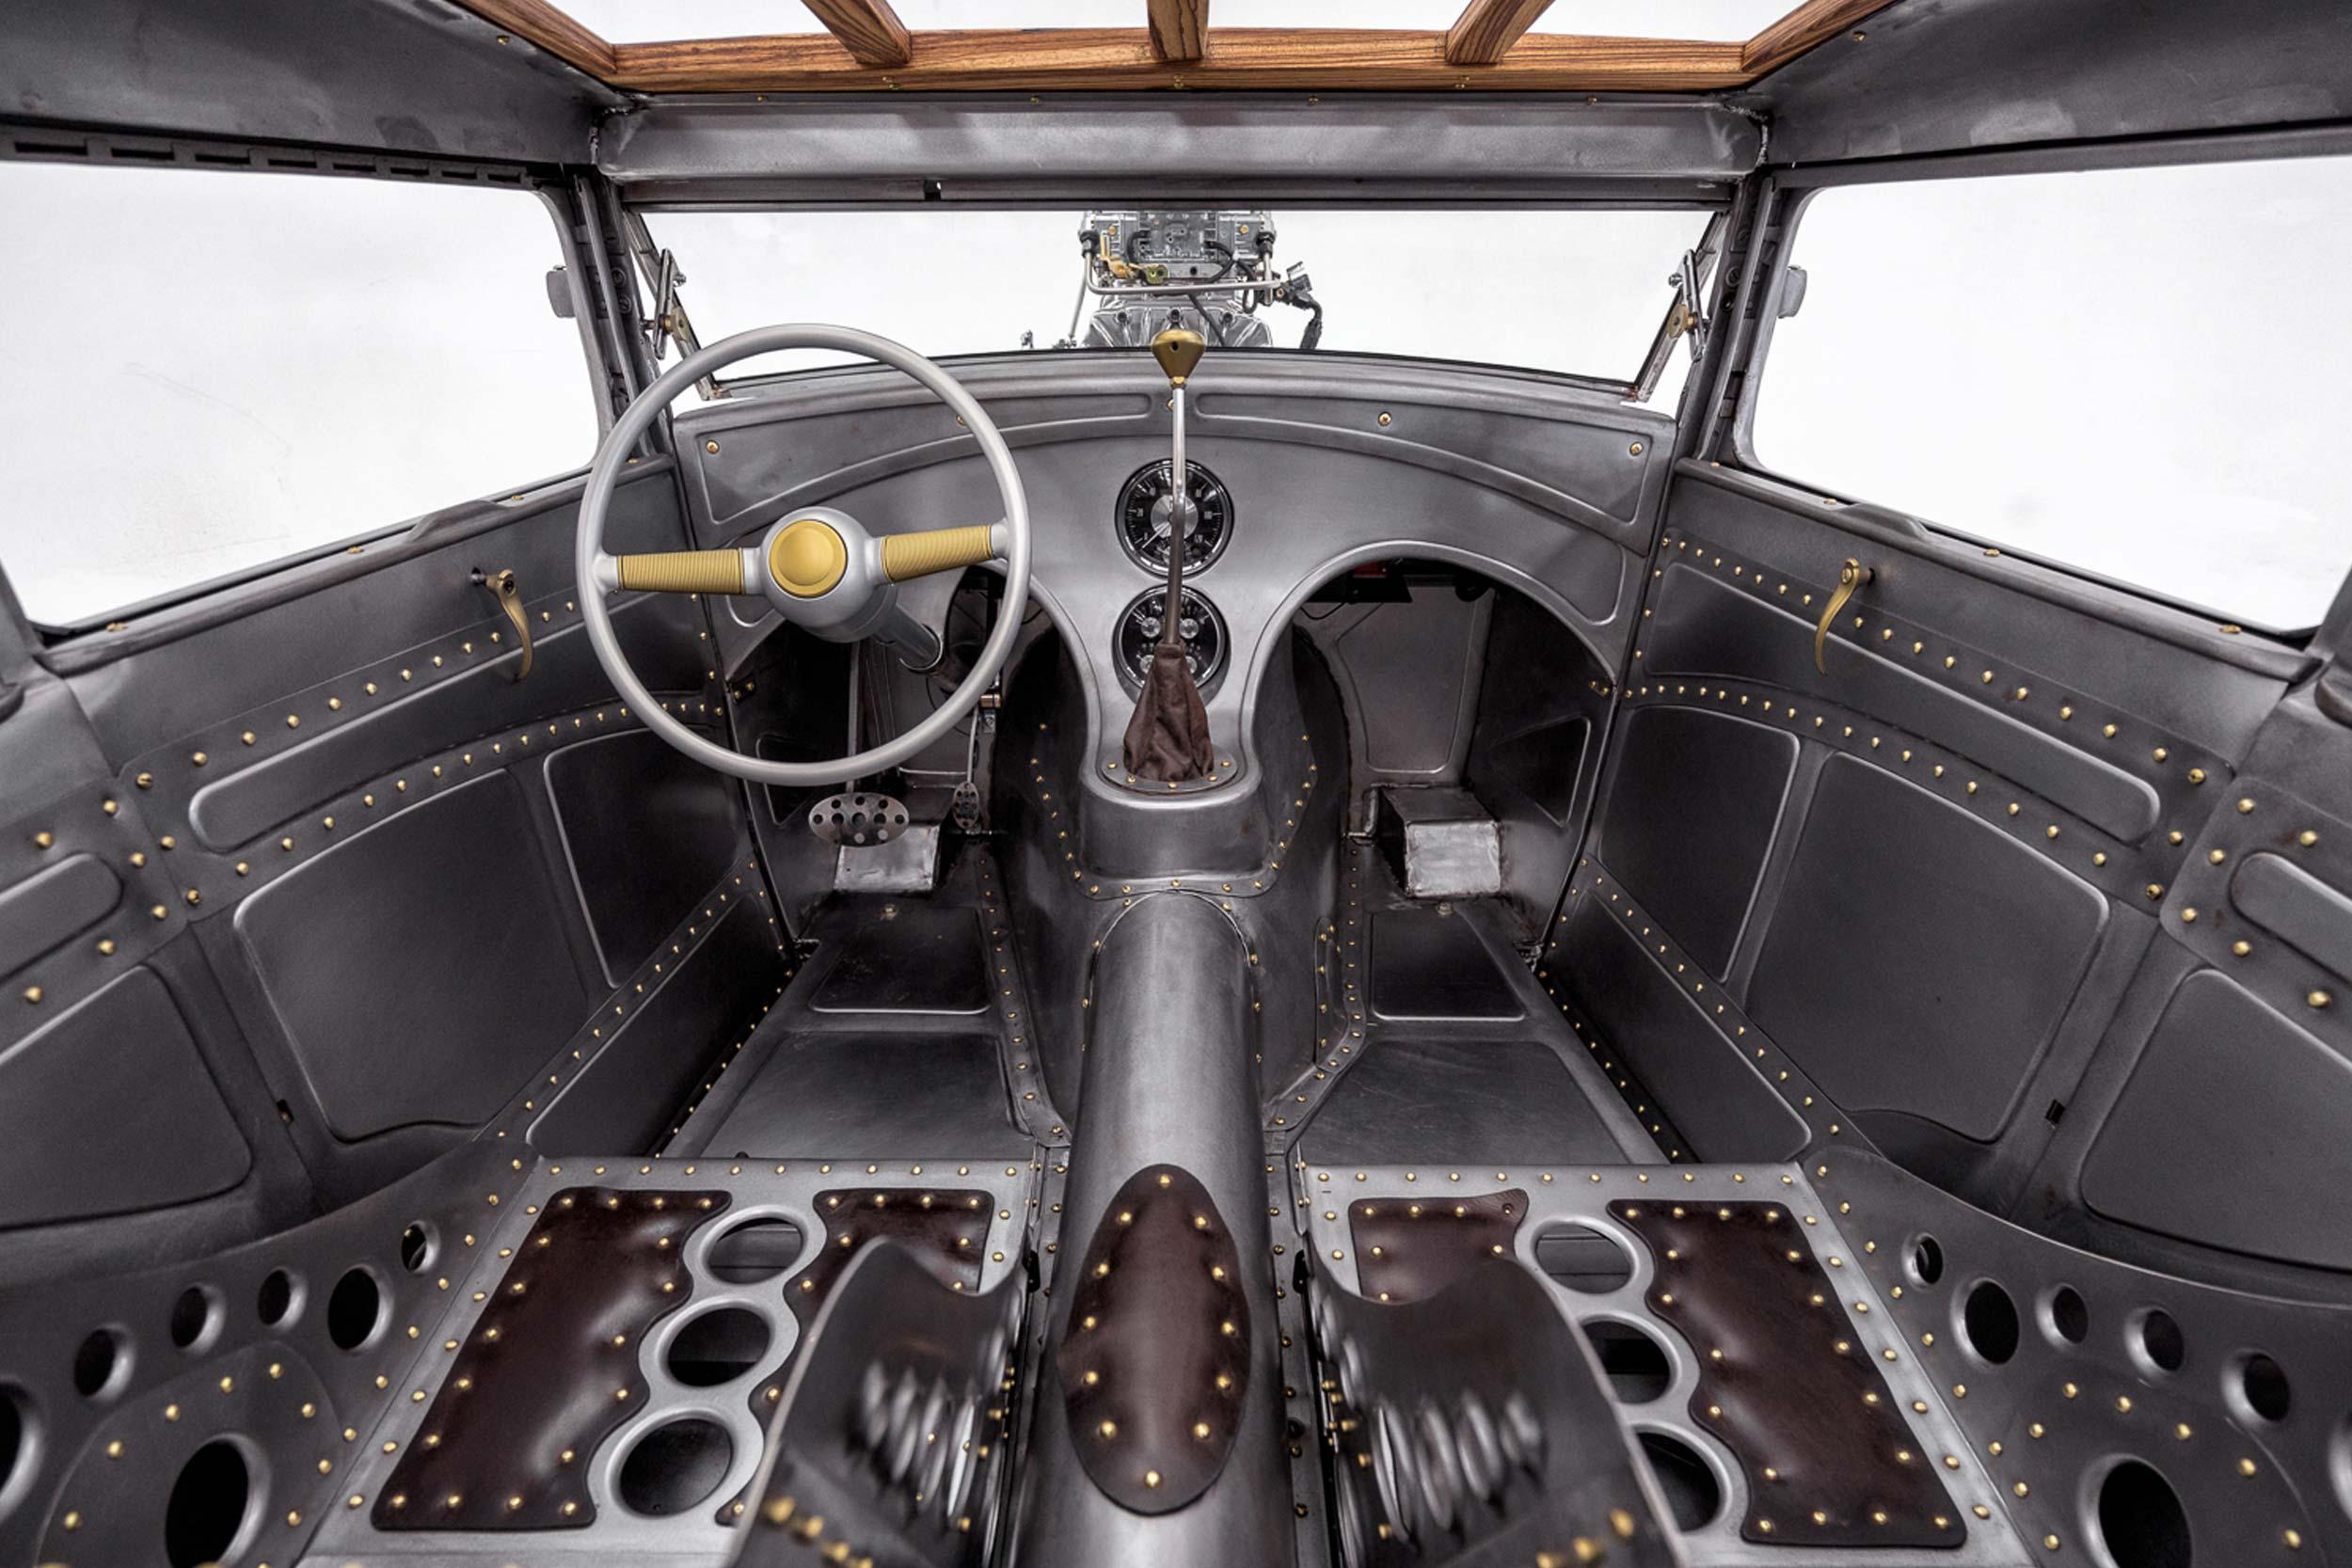 1930 Ford Model A interior